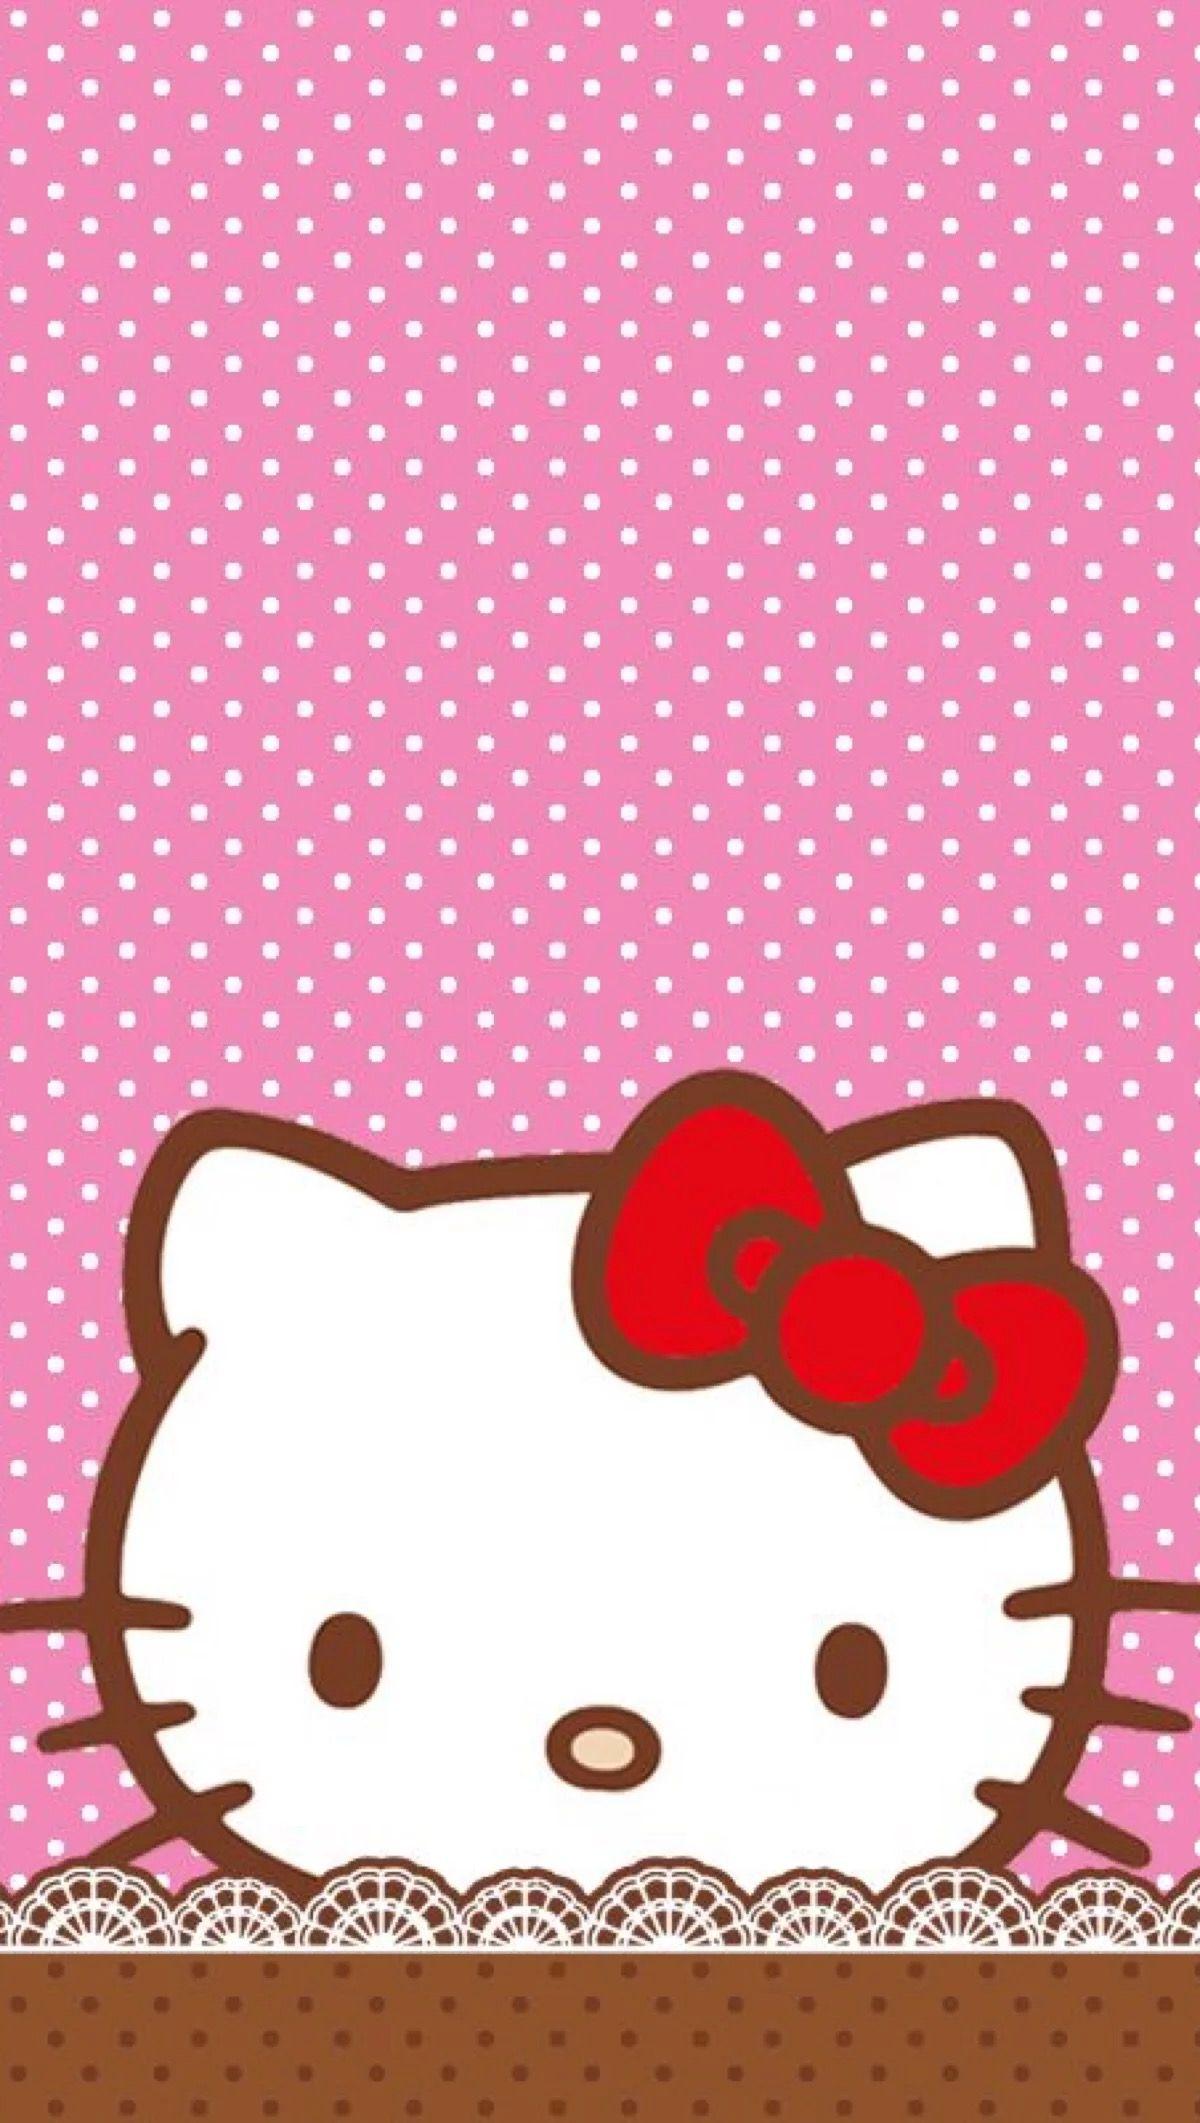 Amazing Wallpaper Hello Kitty Iphone 4 - 873b25bf7622e41b508a48b717e3ae5e  Perfect Image Reference_574111.jpg